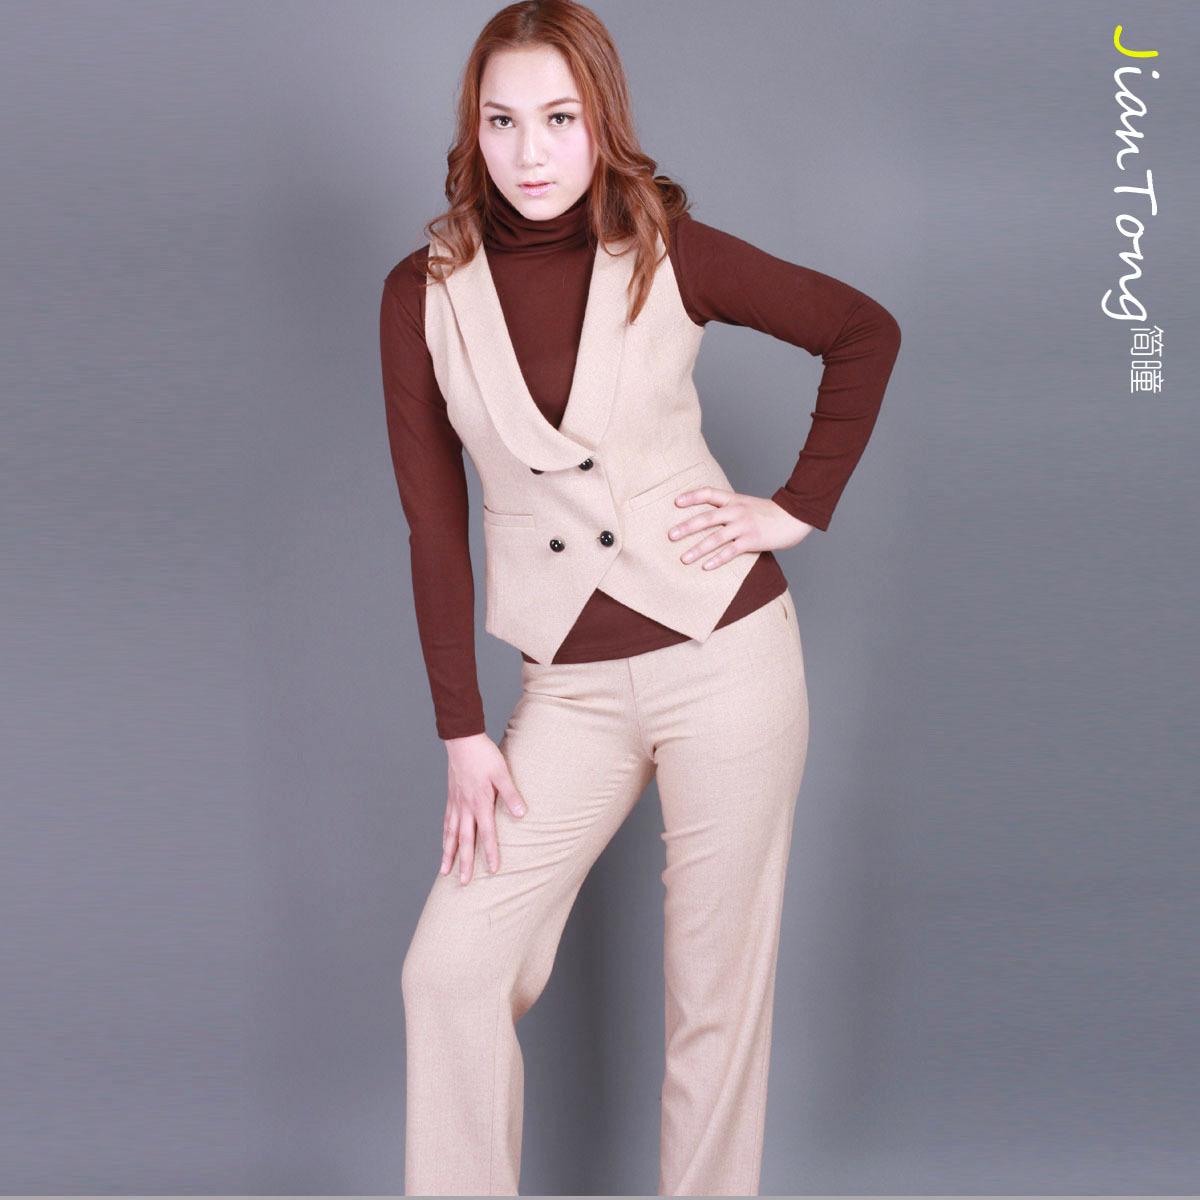 【Tmall狂欢节】秋装大码新品短袖外套长裤职业女裤套装特价2014